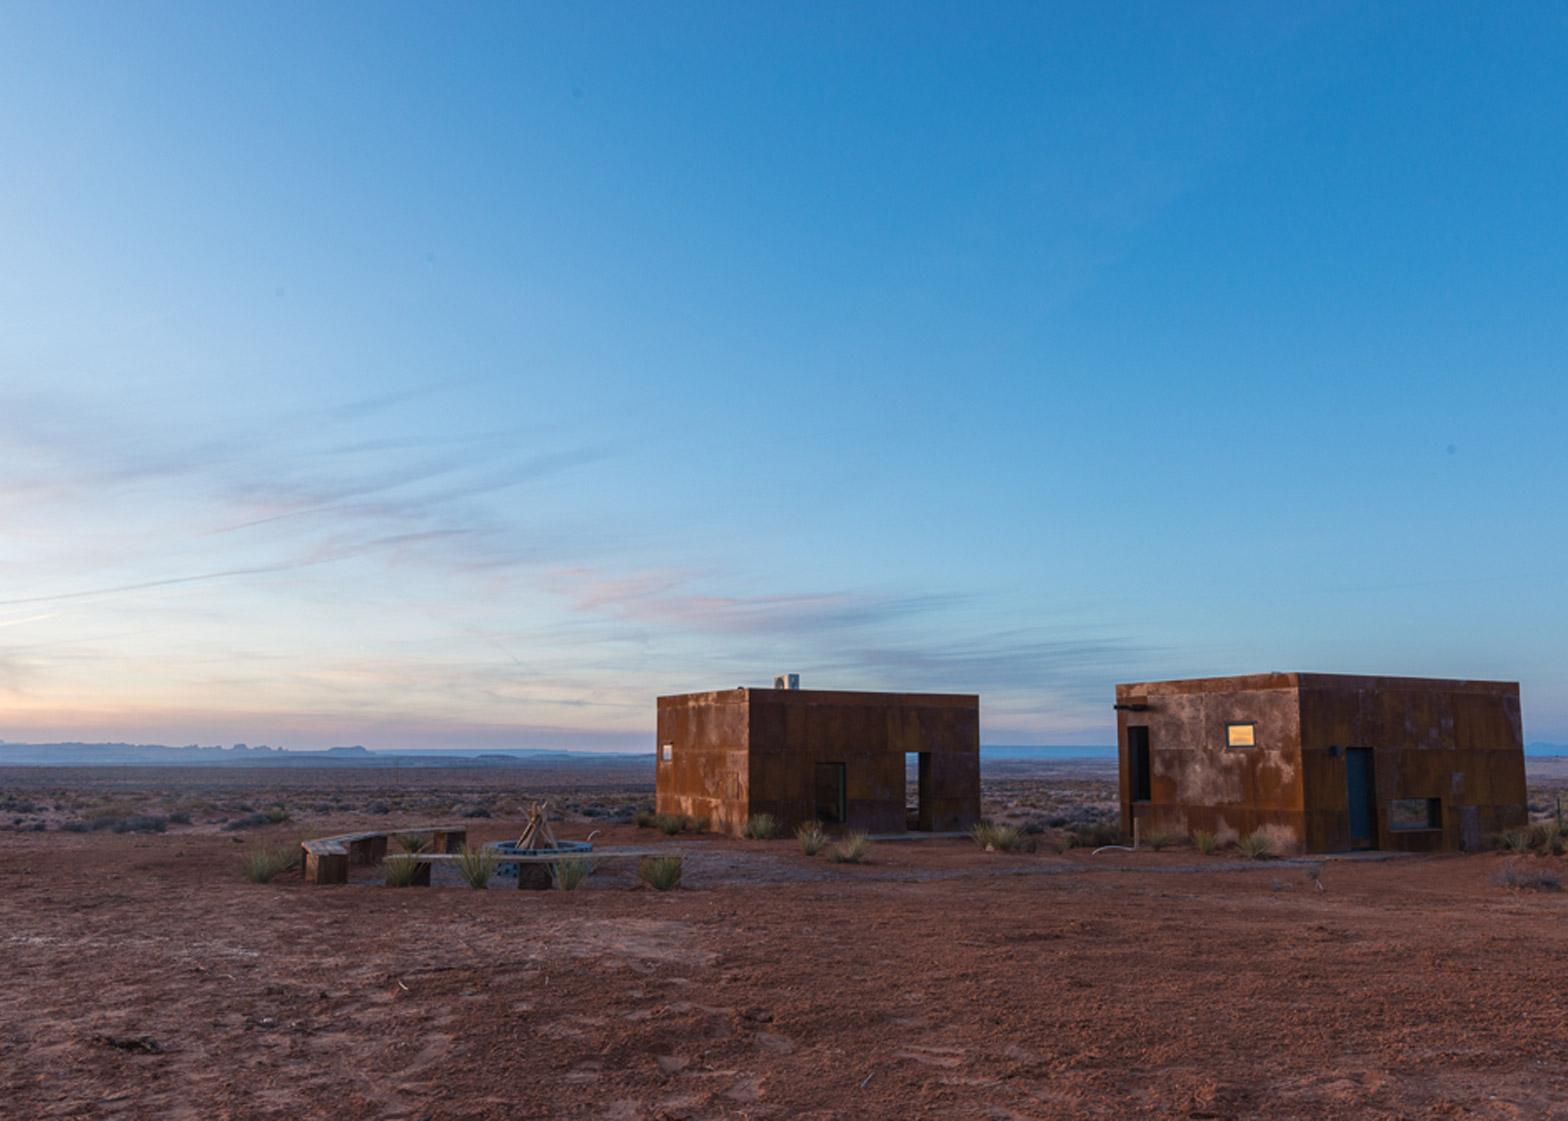 Navajo Micro Cabins by University of Colorado graduate students